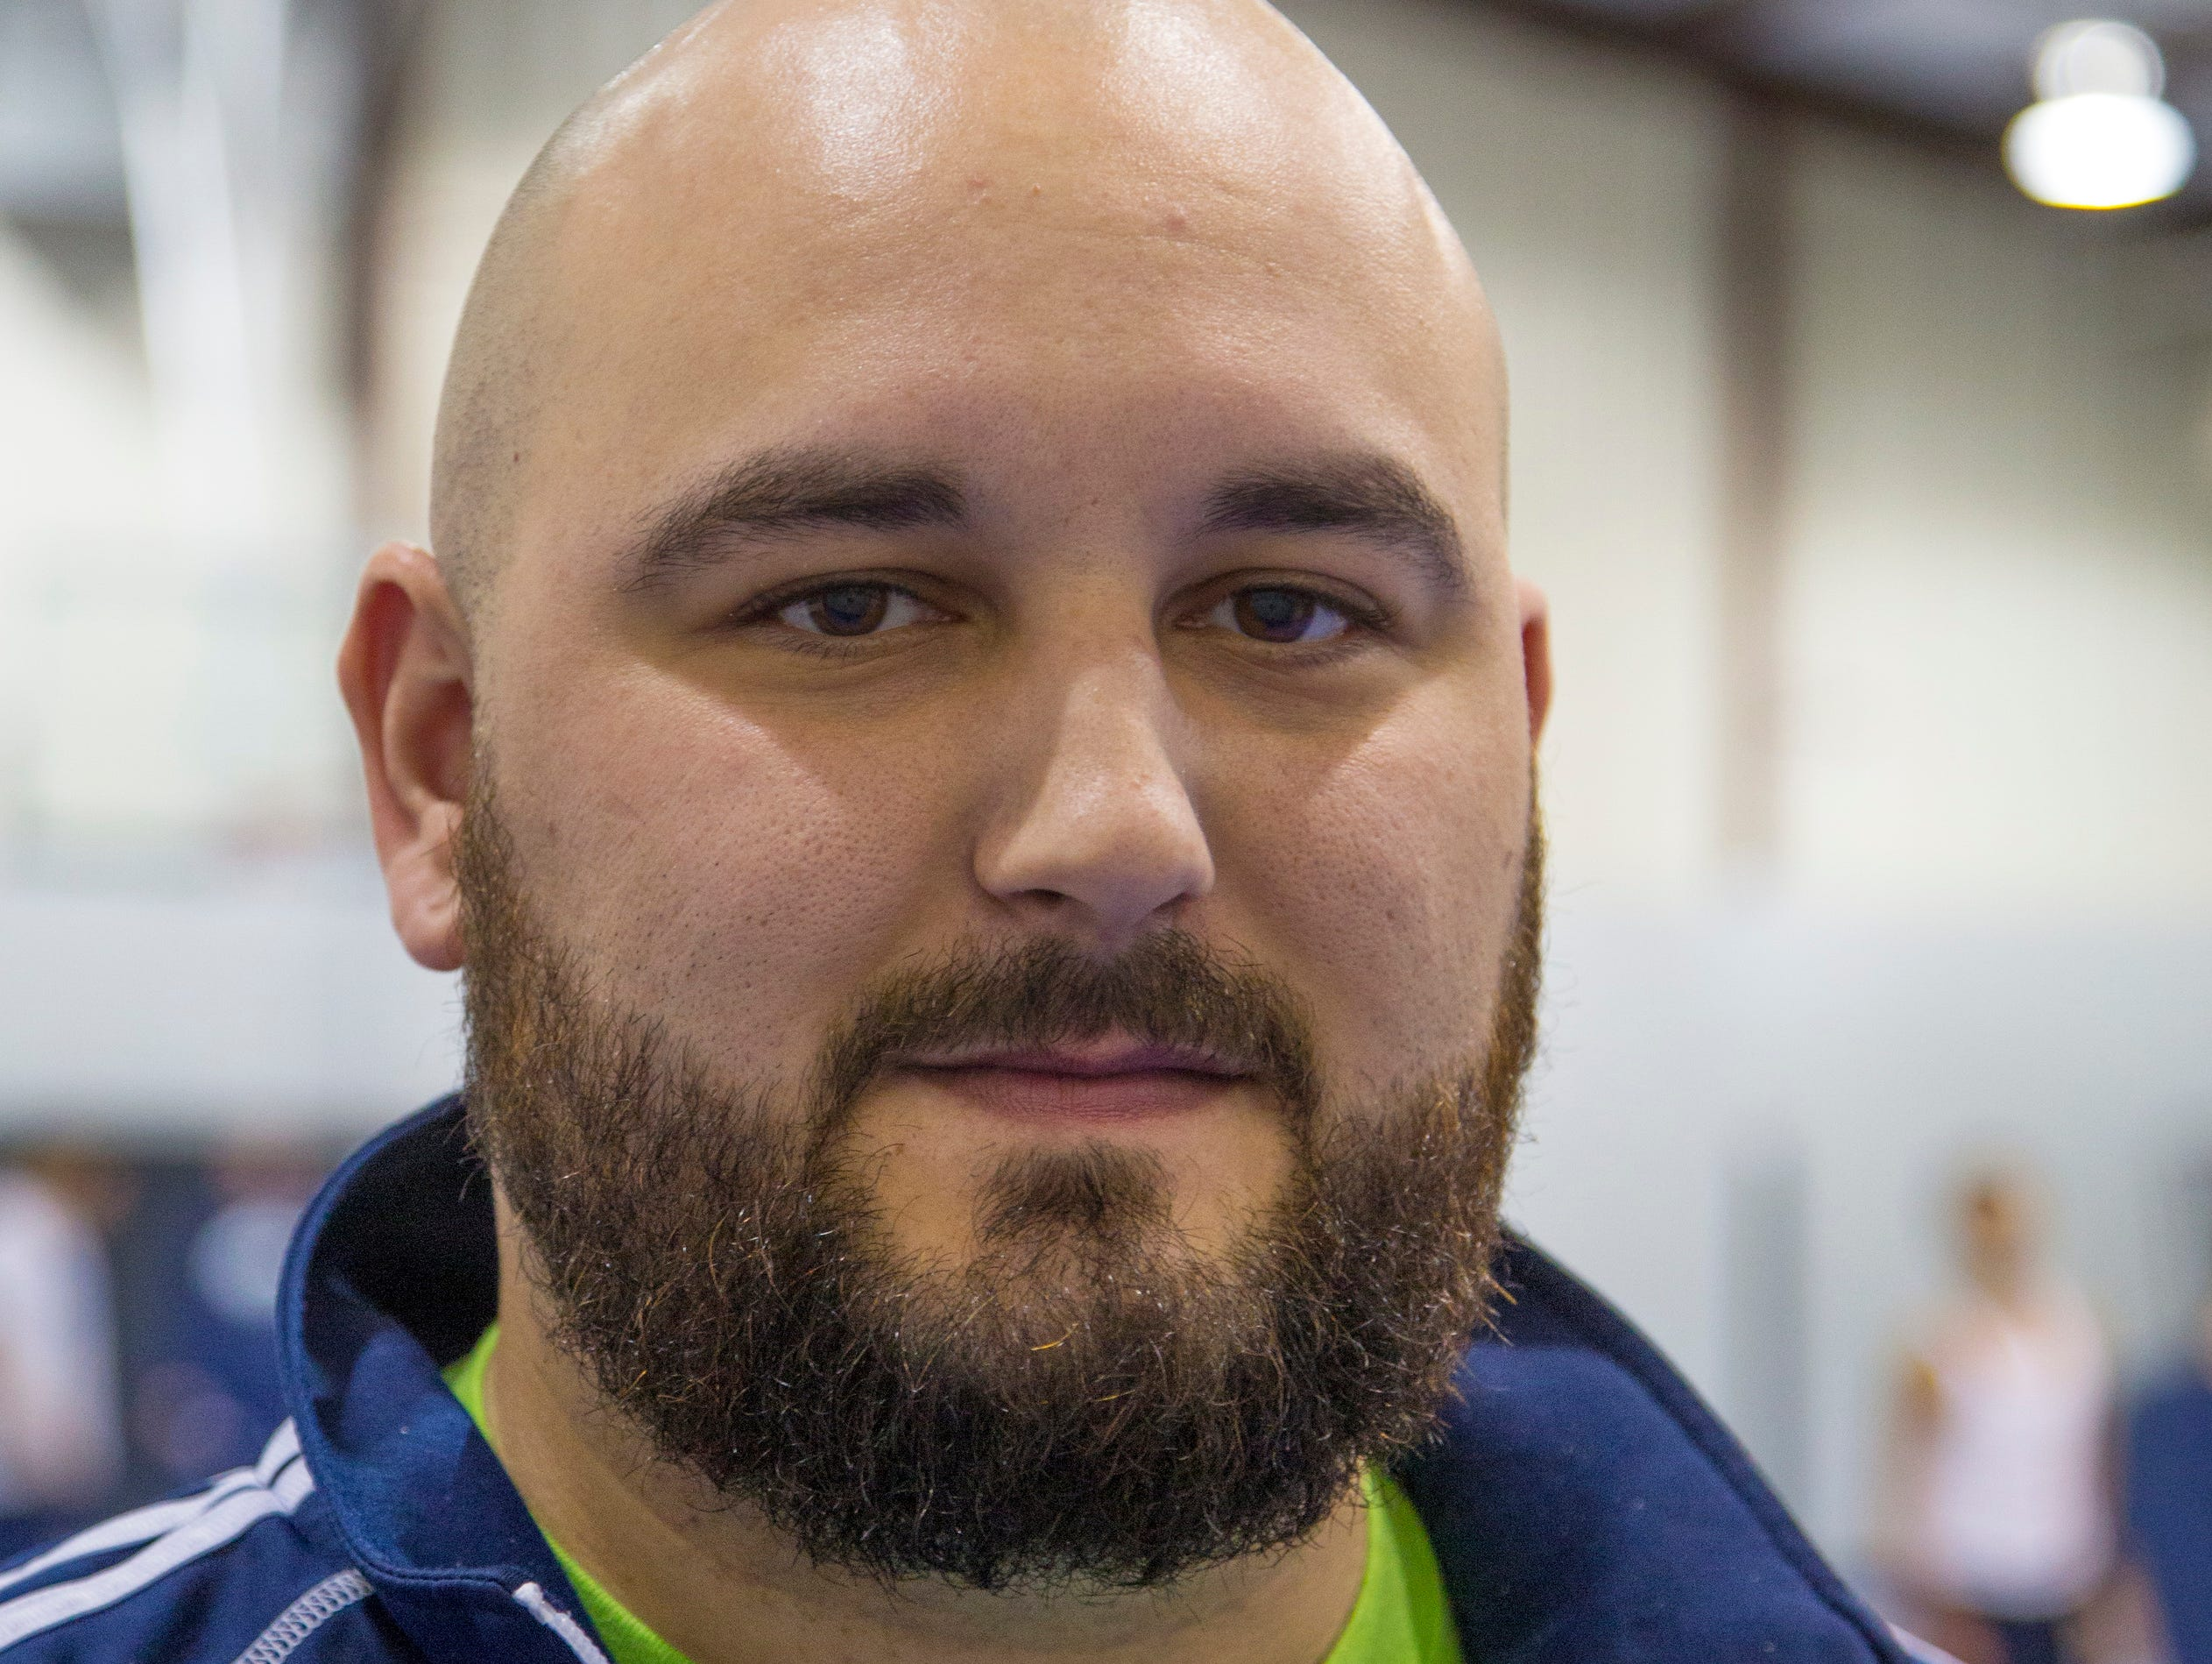 Dustin Sperling, Woodward Academy coach